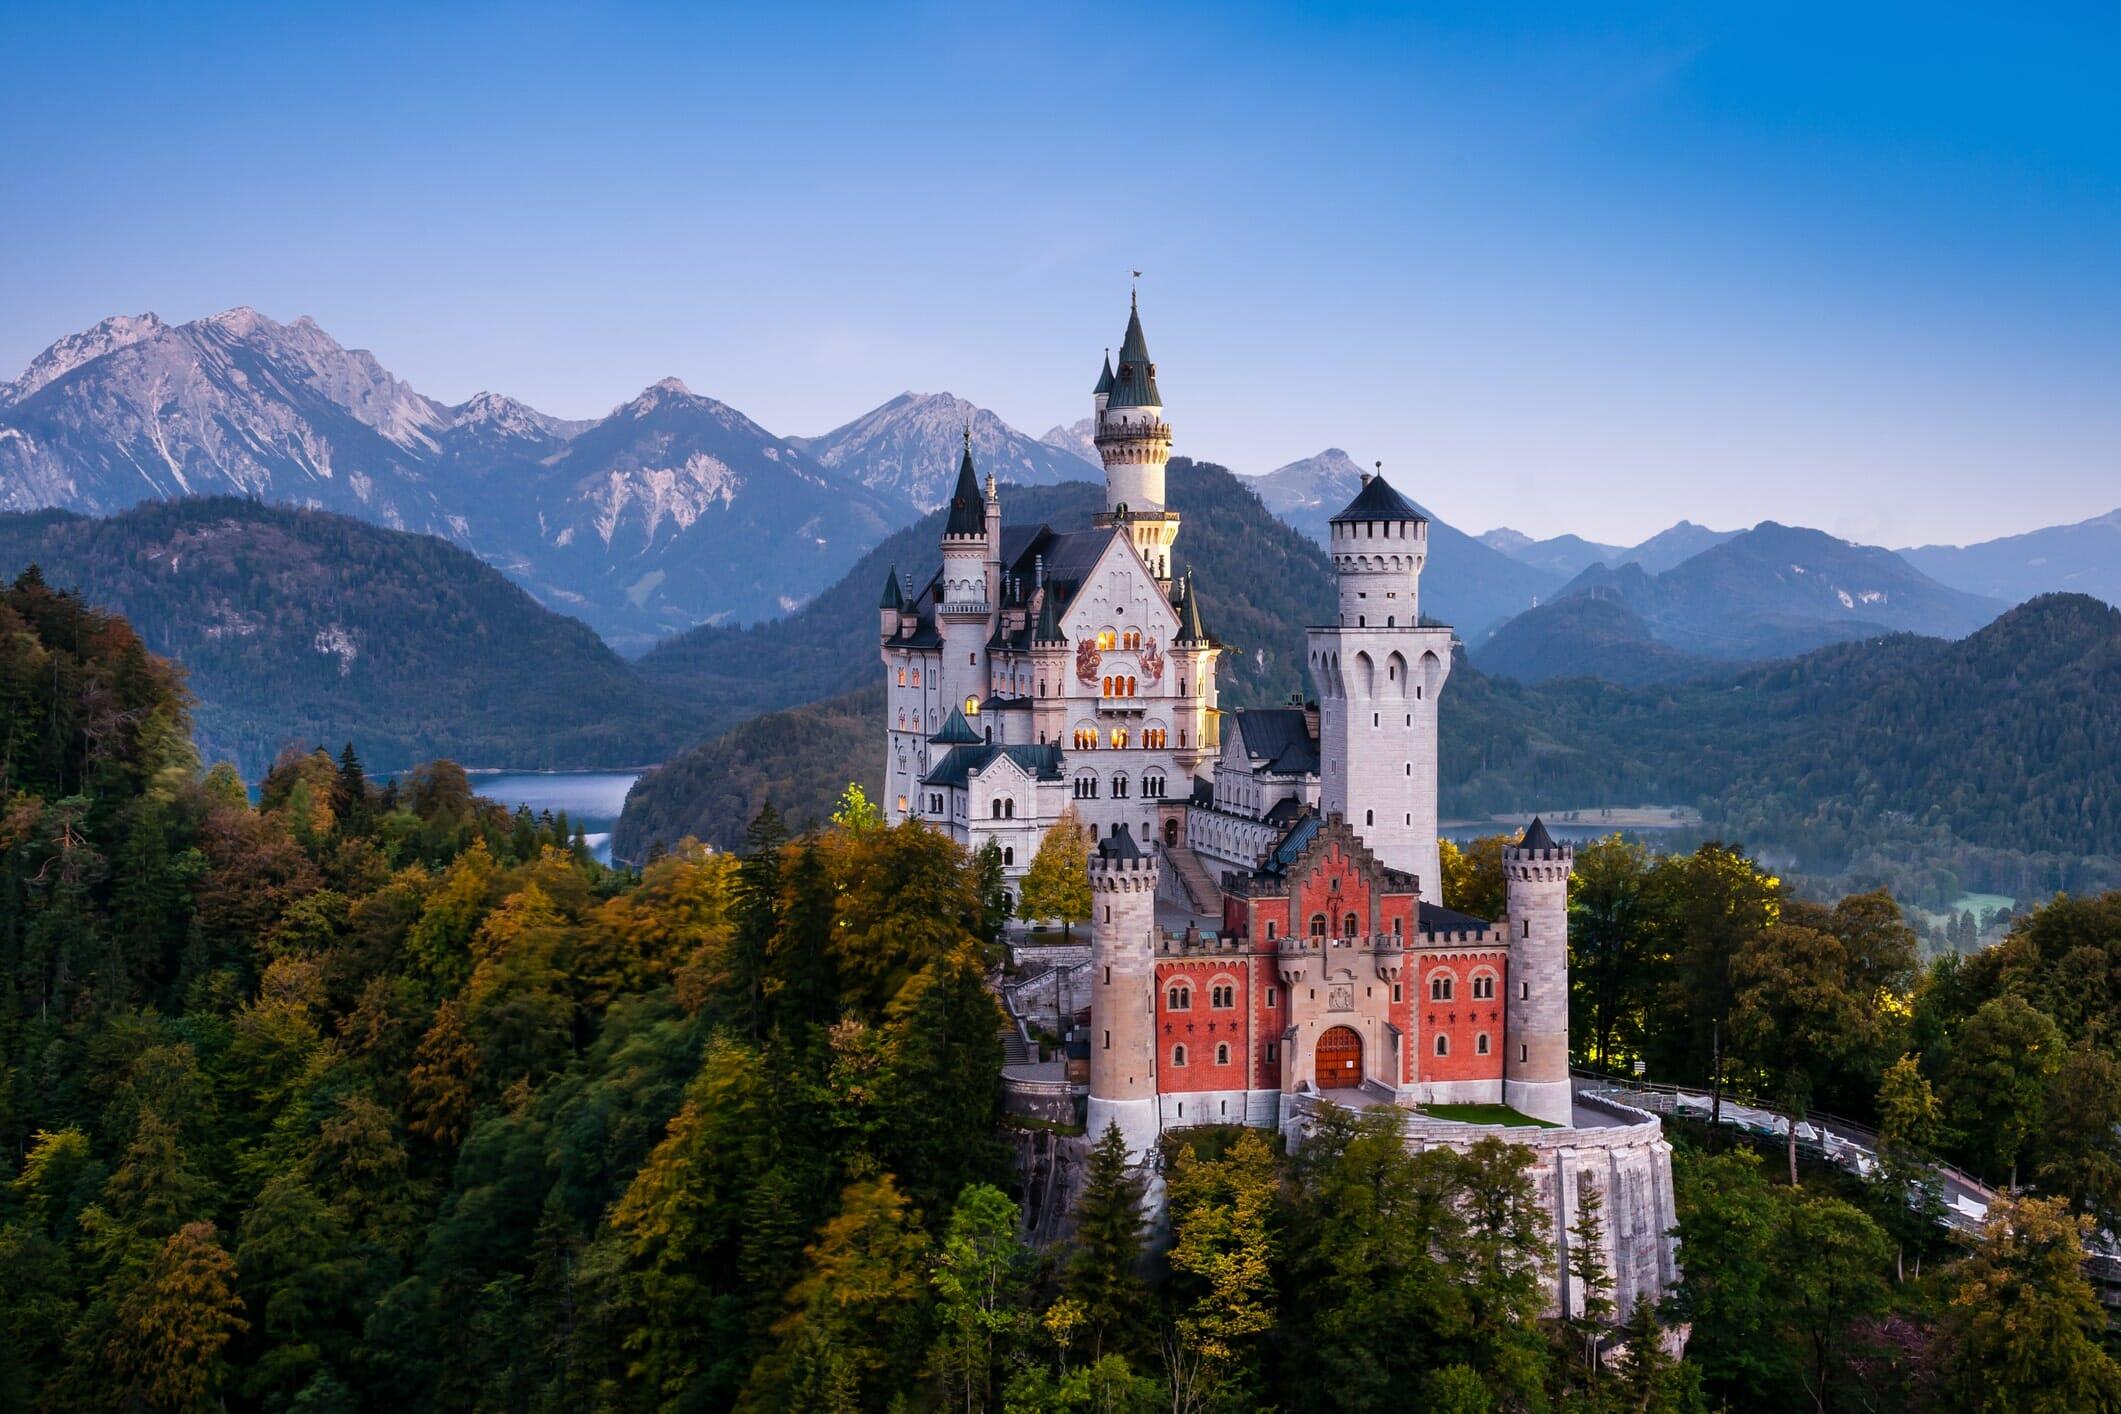 Famous Neuschwanstein Castle in Bavaria, Germany, before sunrise